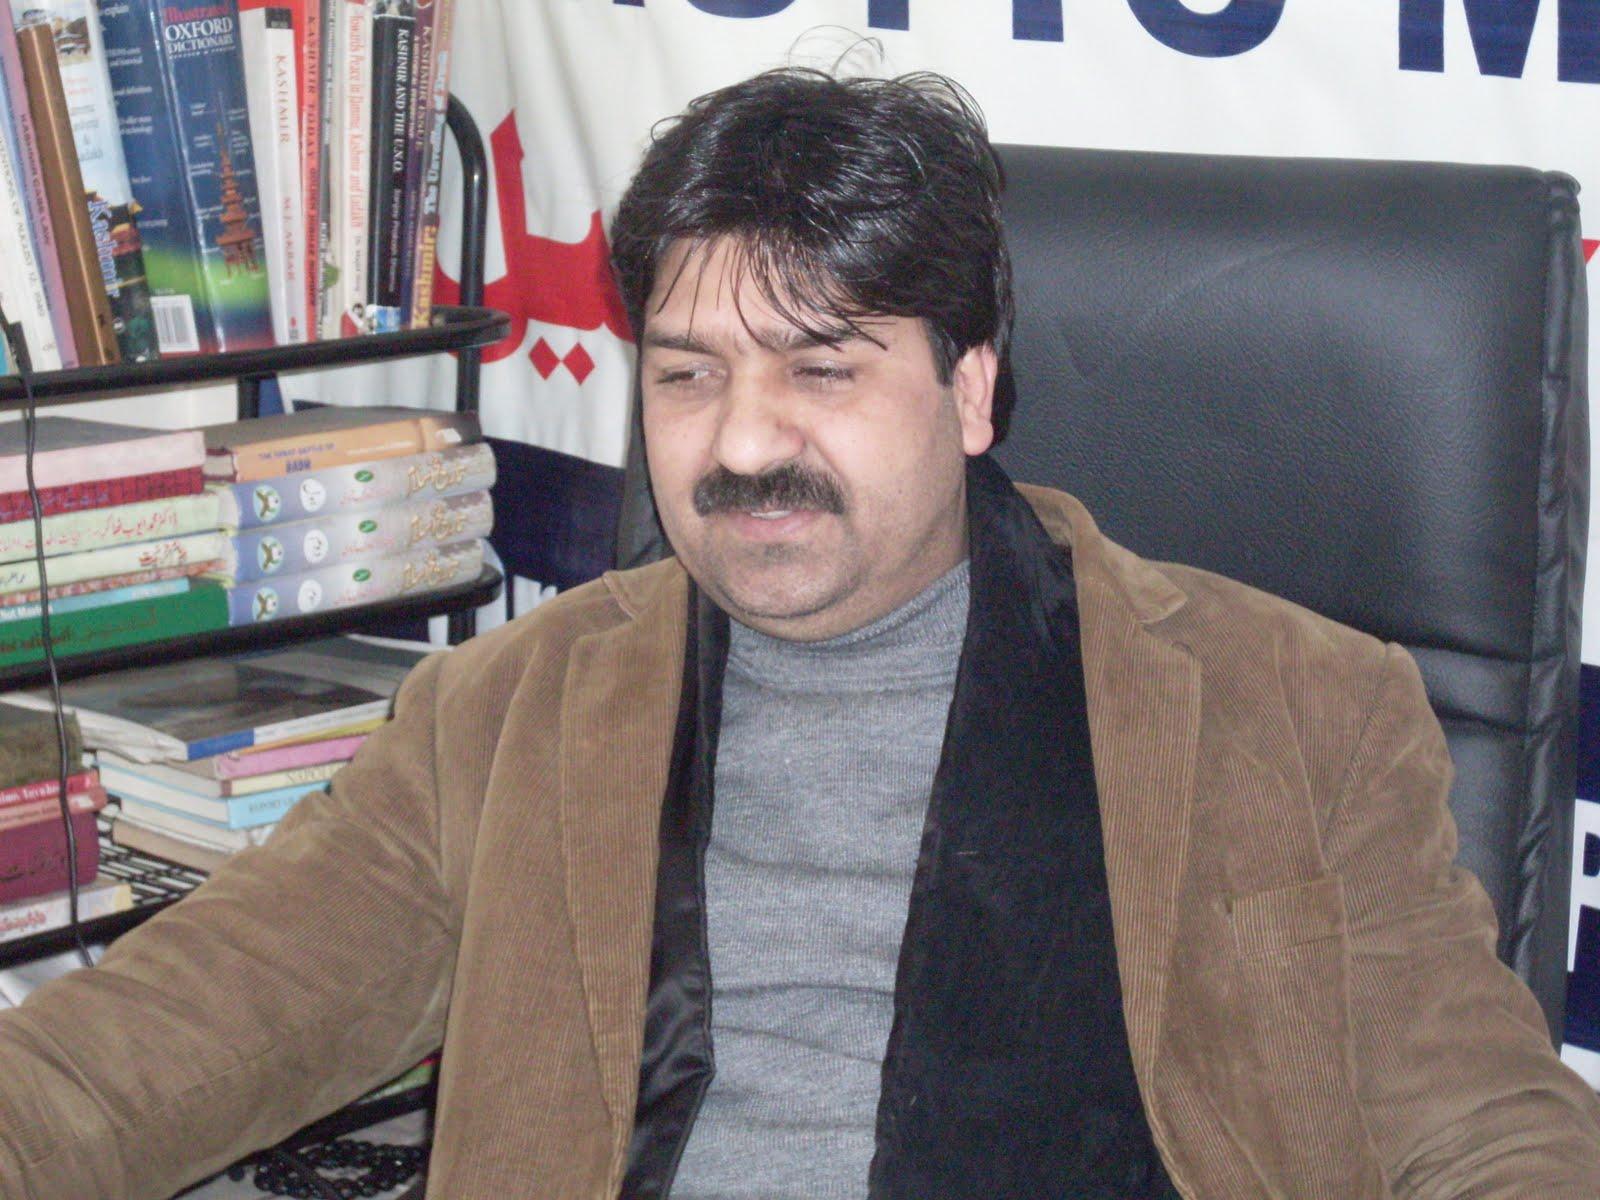 Hurriyat Has No Agenda, Strategy: Engineer Hilal War